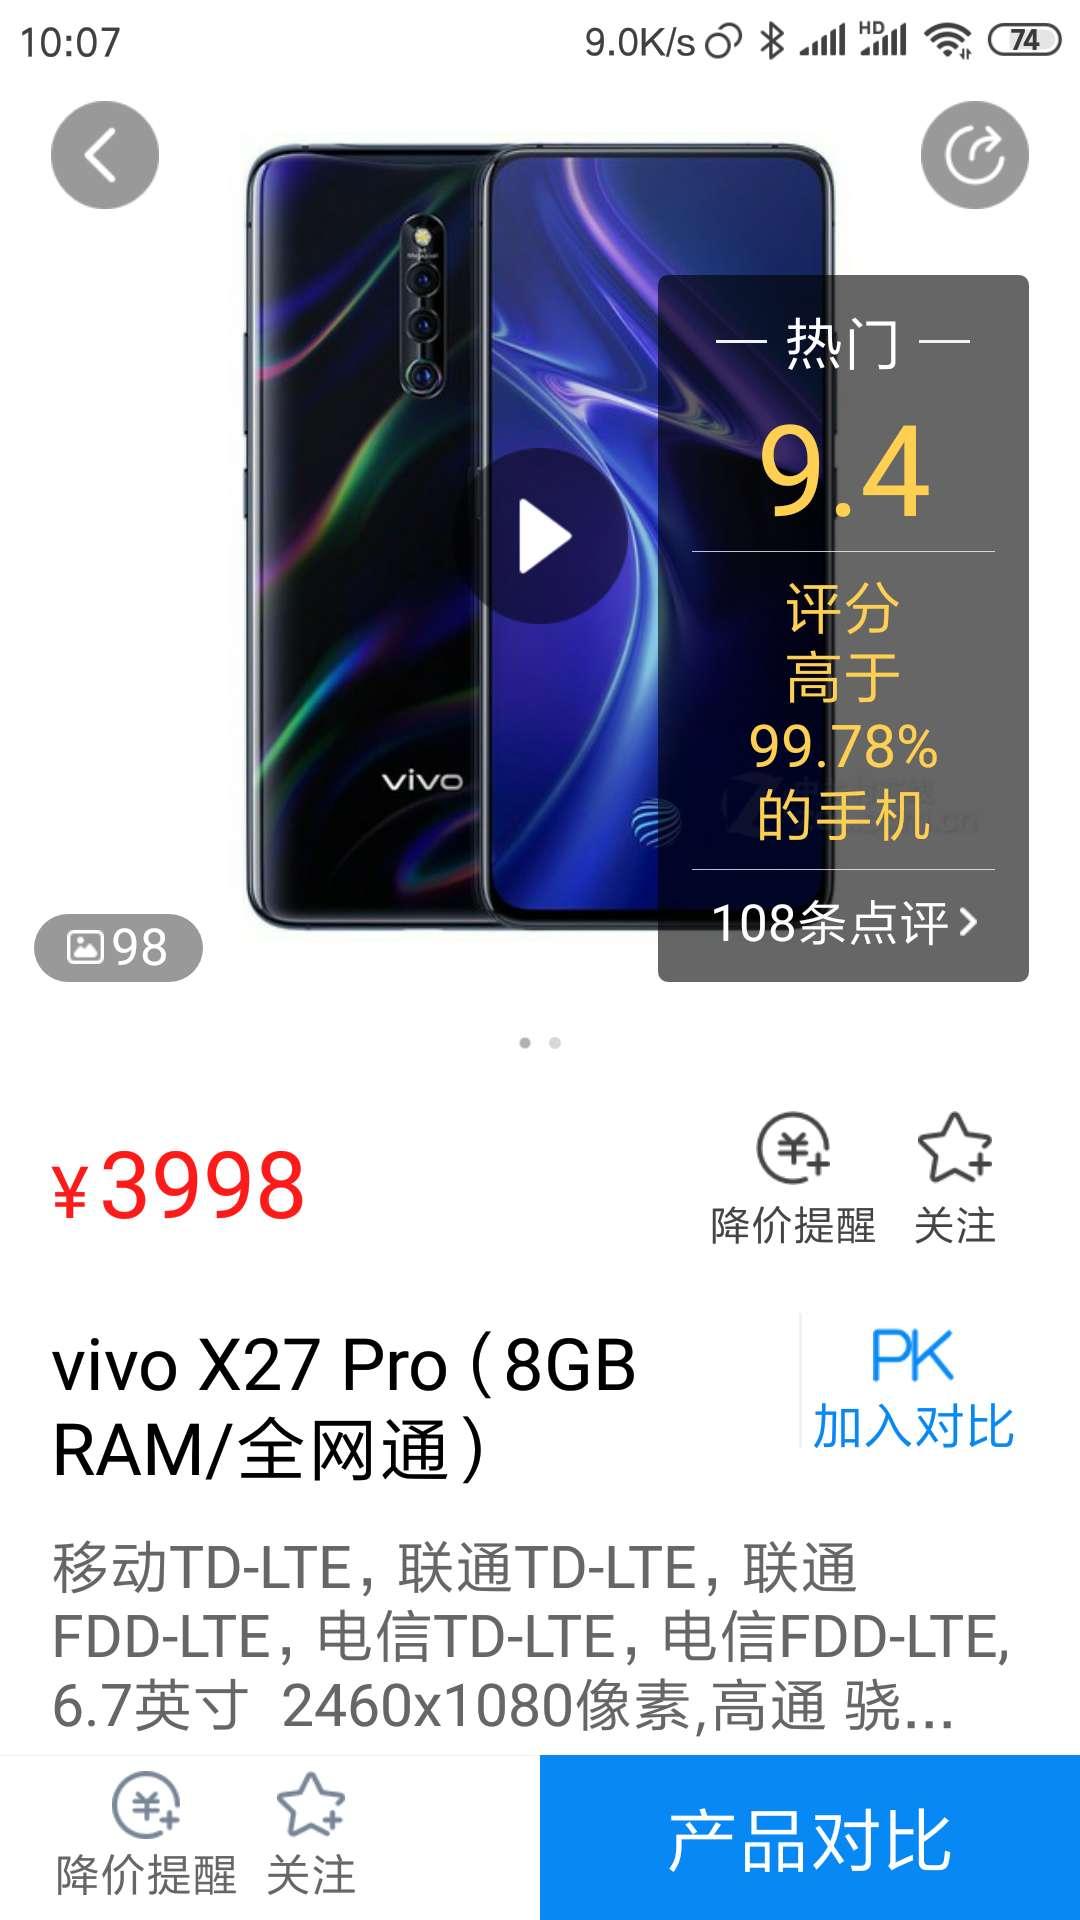 vivoX27Pro有超级夜景功能吗?